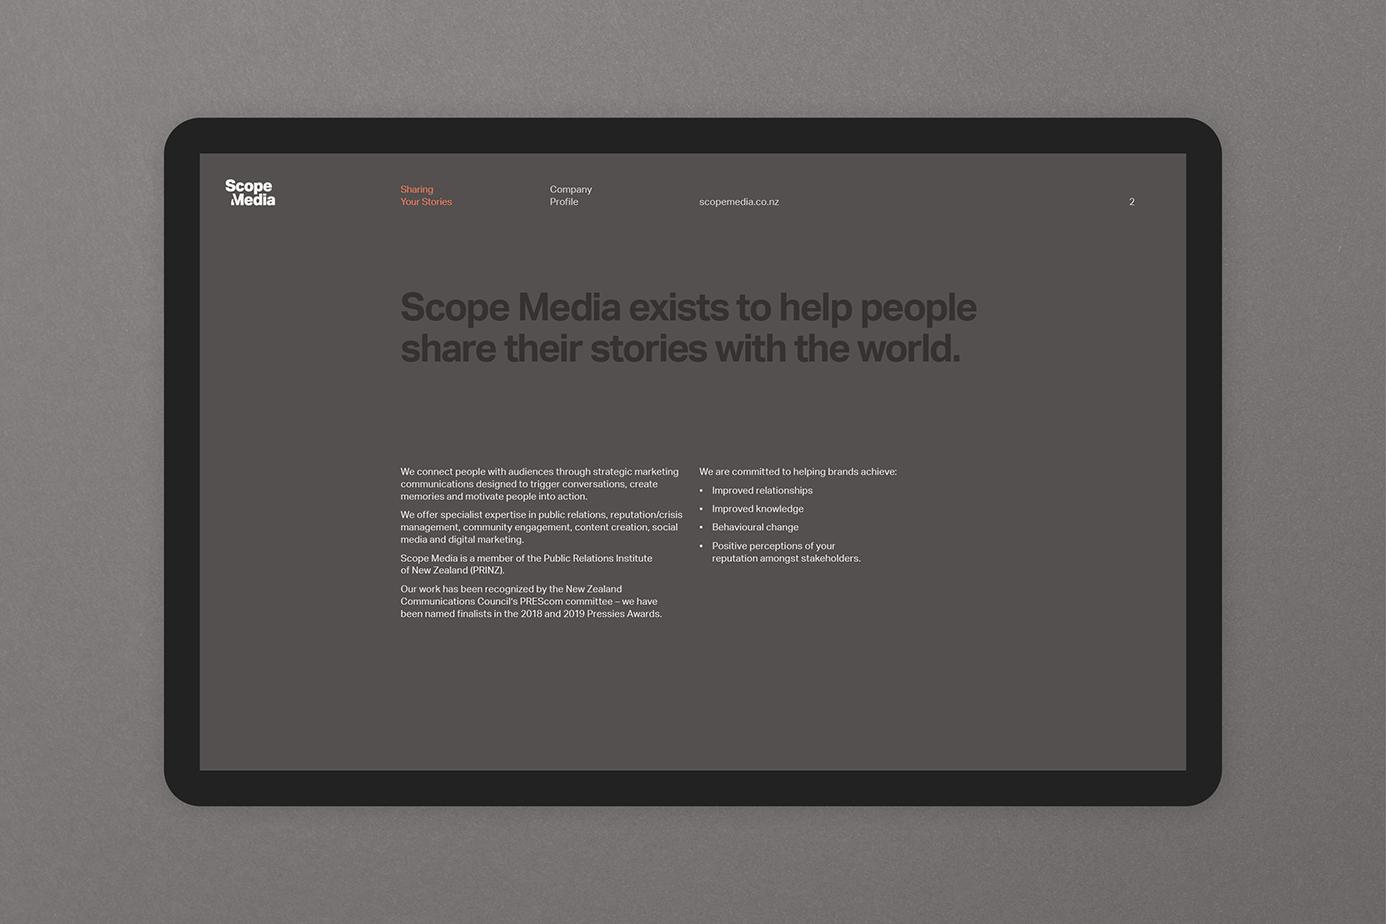 Scope Media